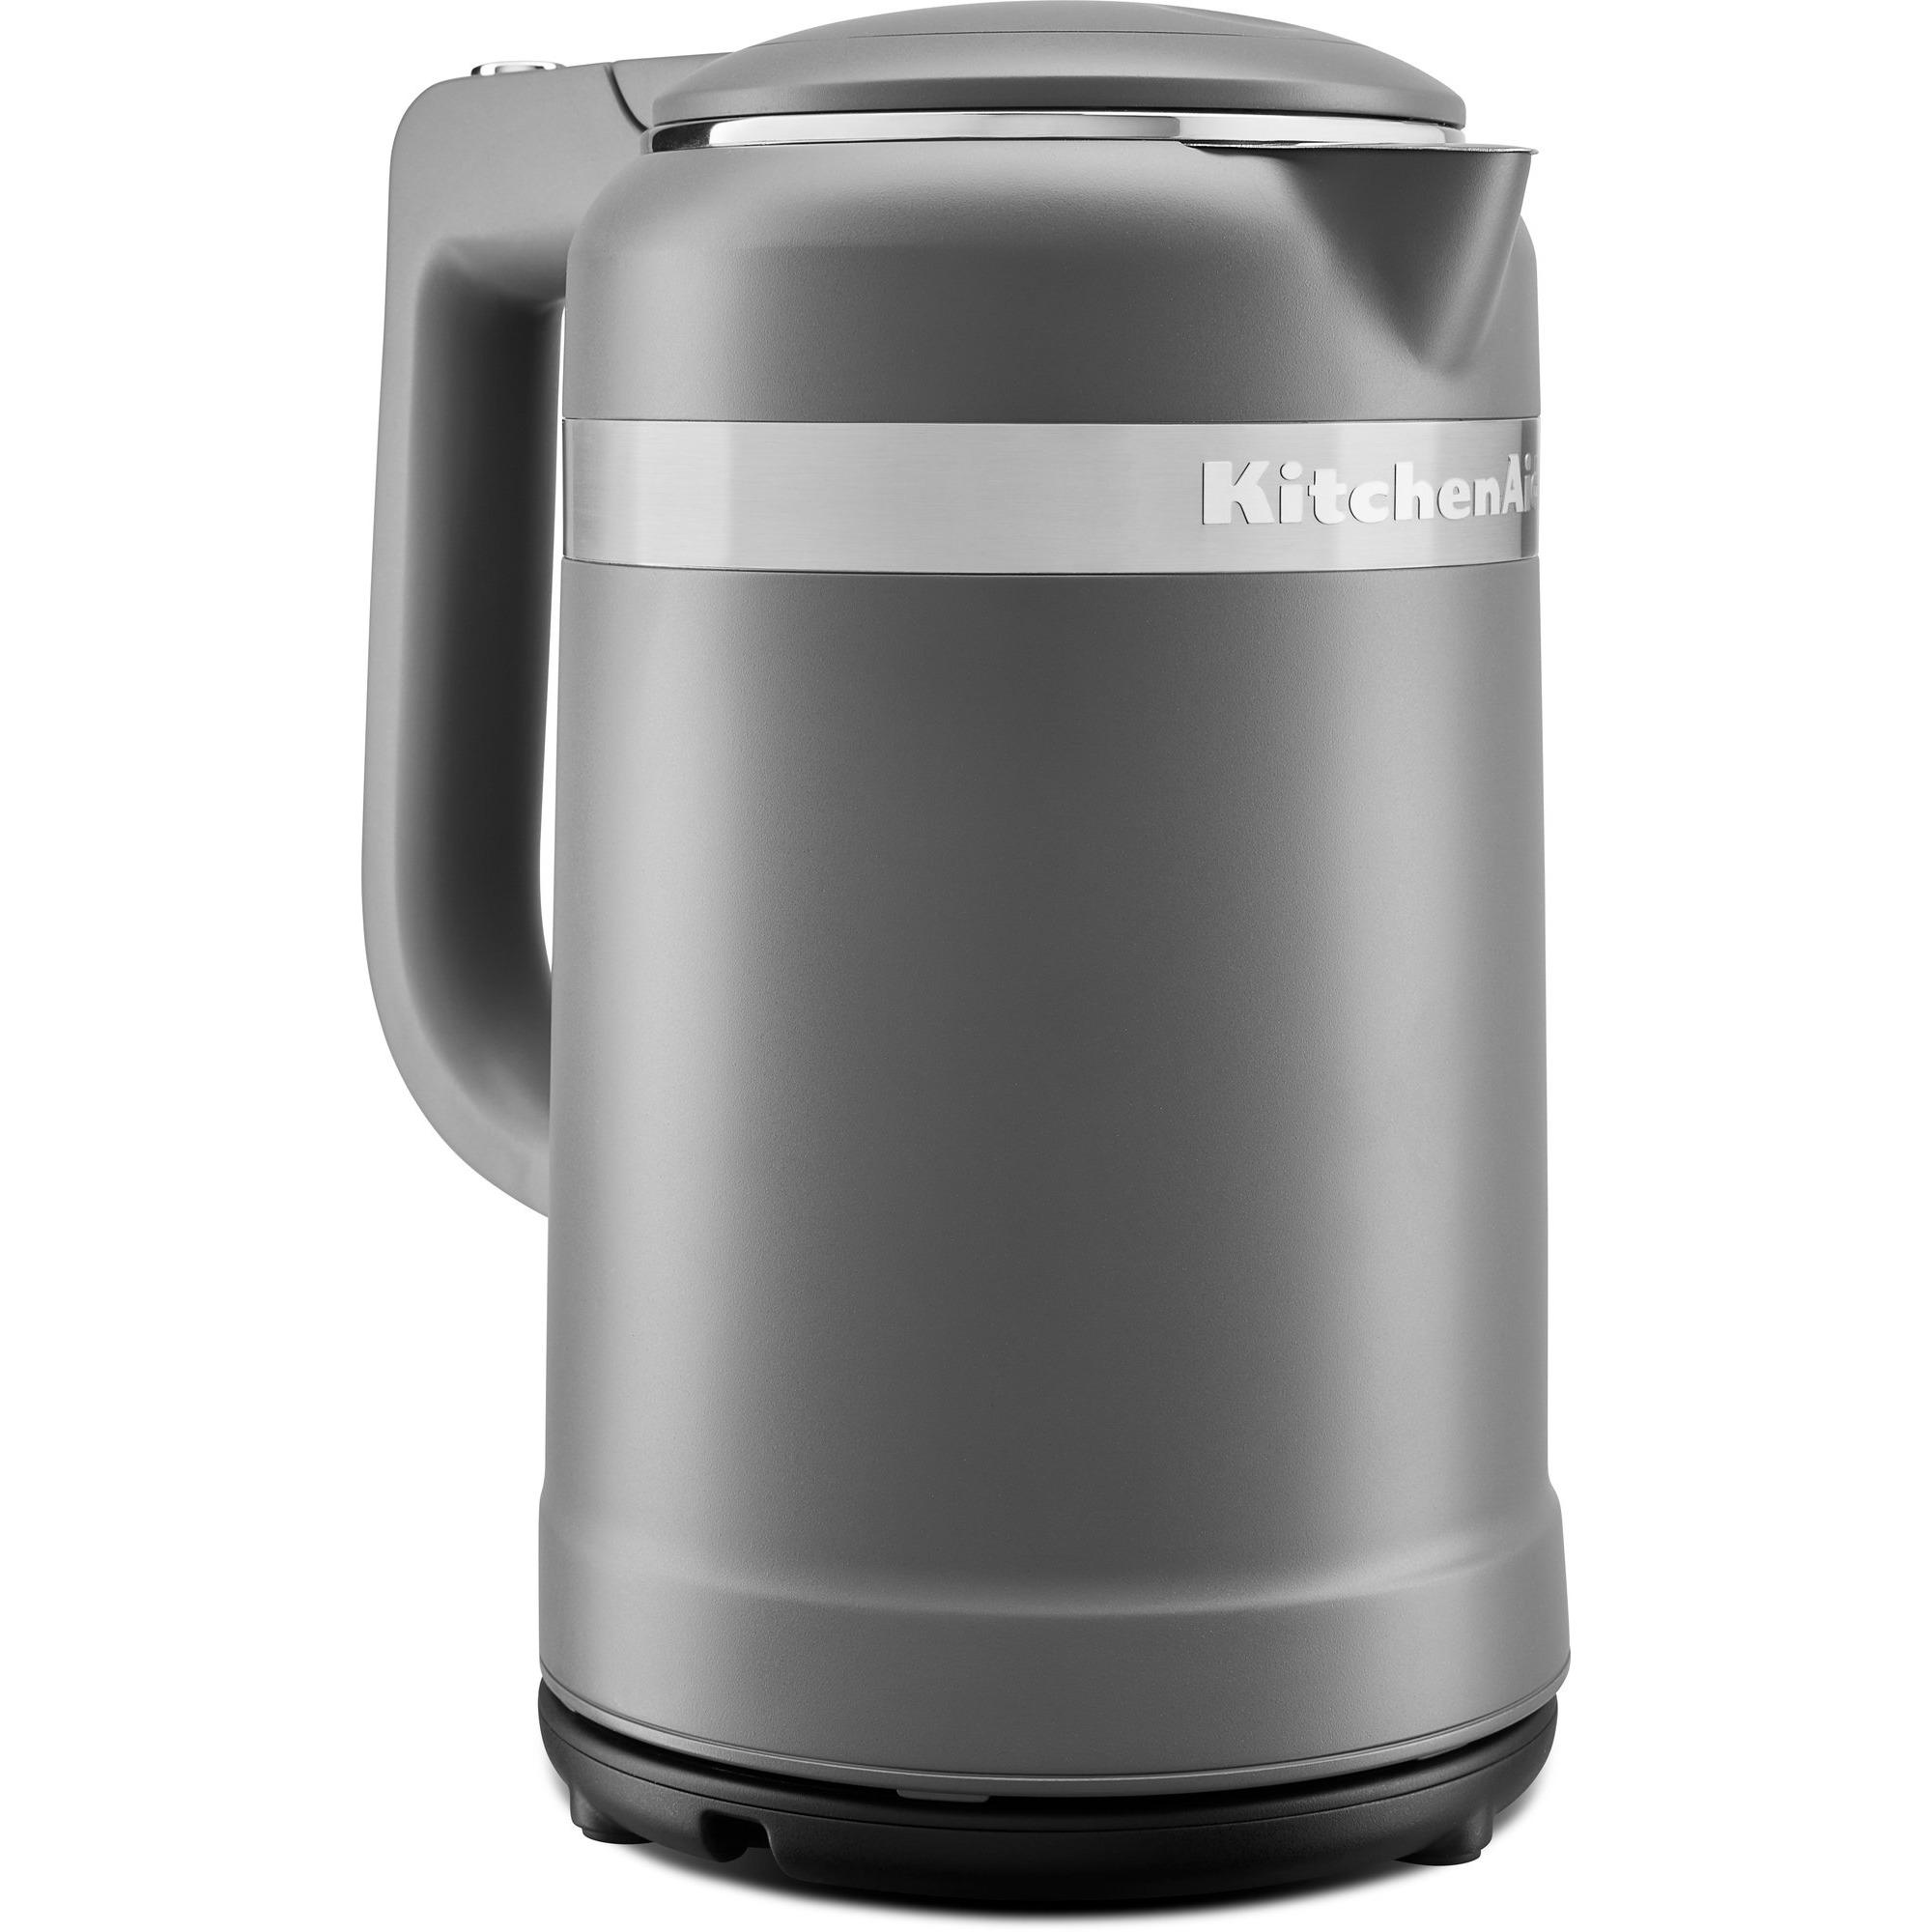 KitchenAid Vattenkokare 5KEK1565EDG 15L Matt grå